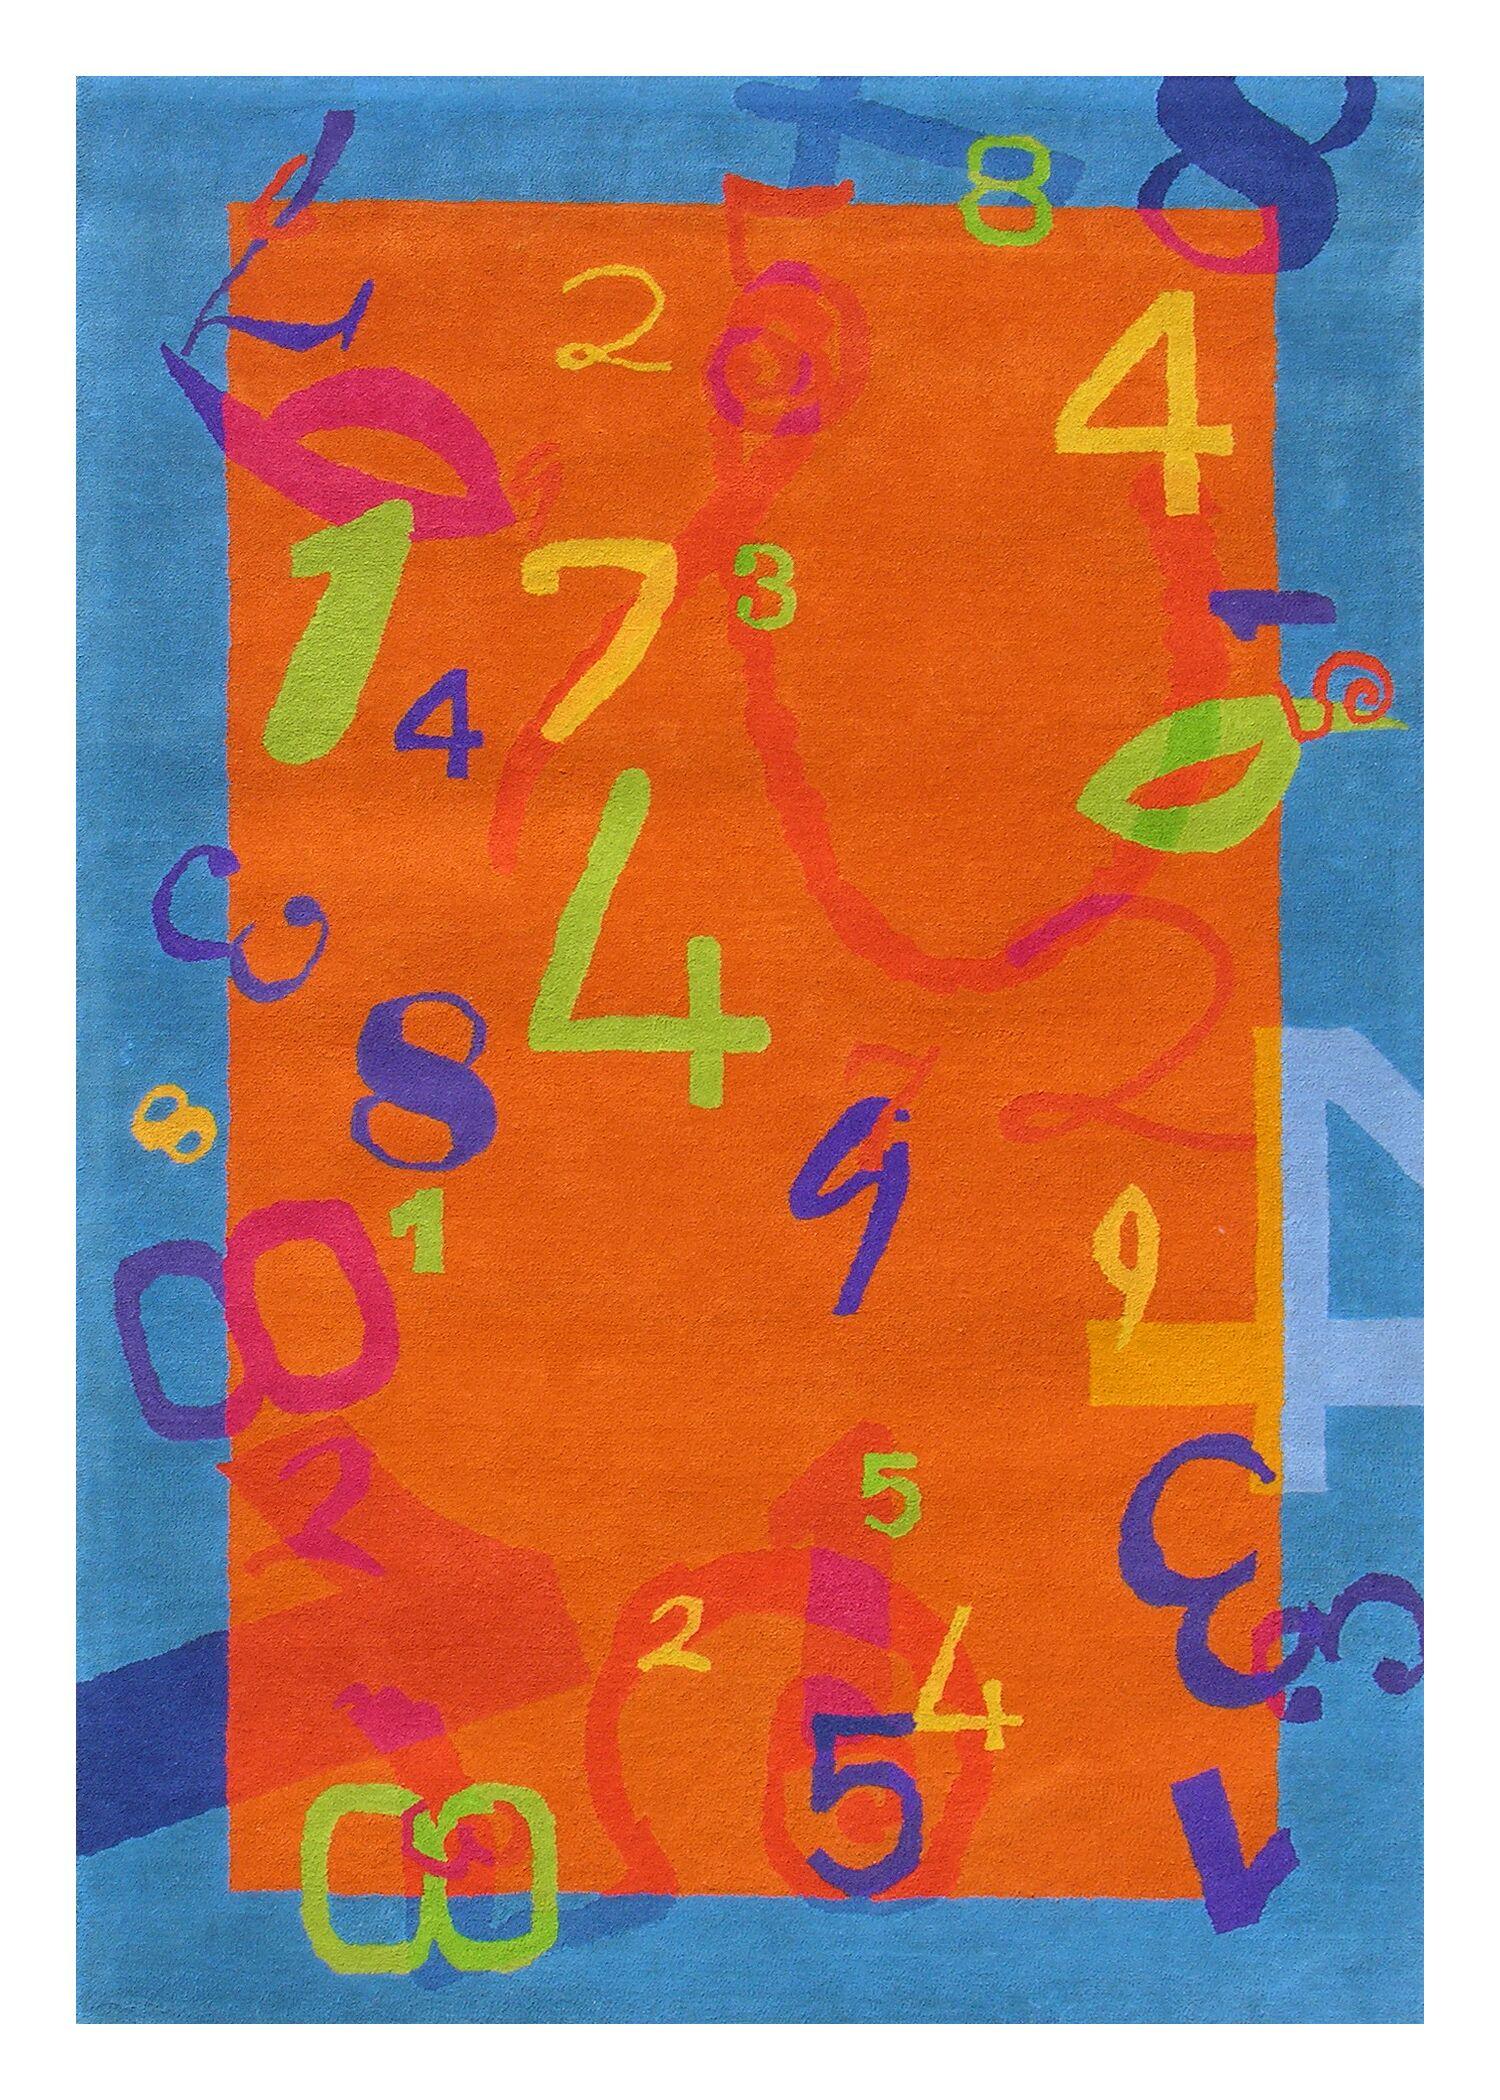 Fantasia Tufted Wool Orange/Blue Area Rug Rug Size: Rectangle 7'6